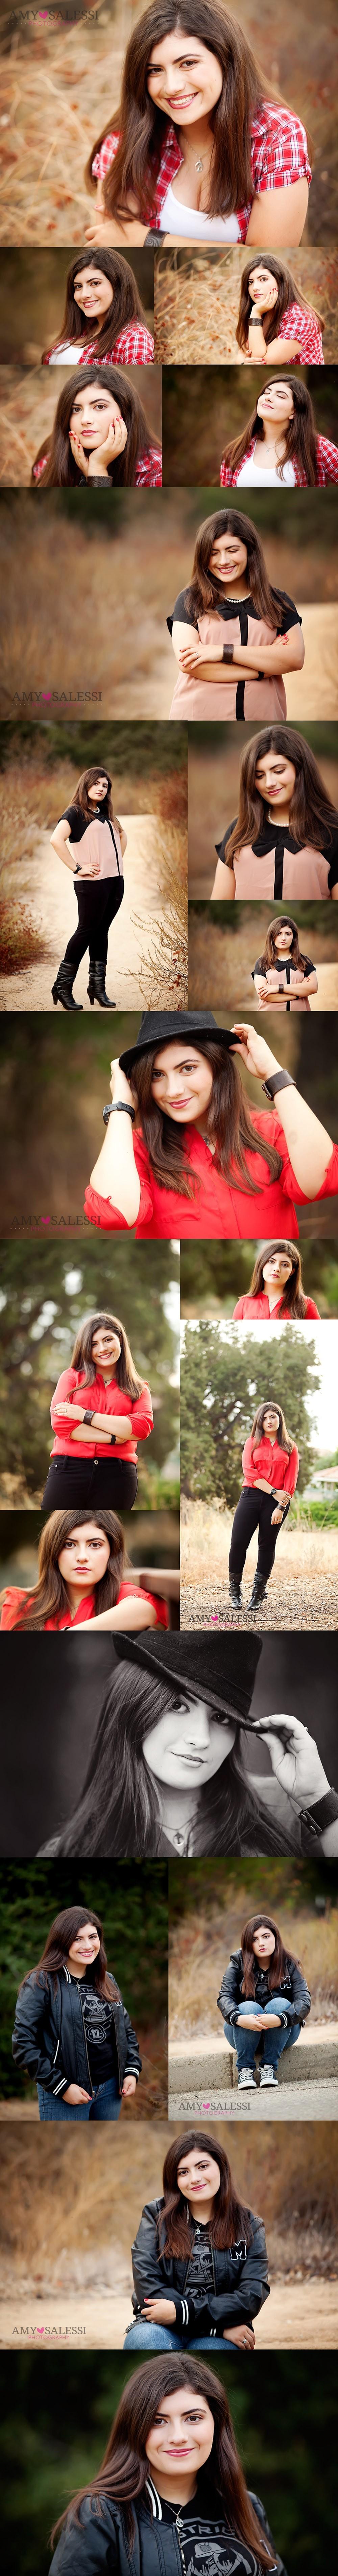 Senior Photographer Glendora, California